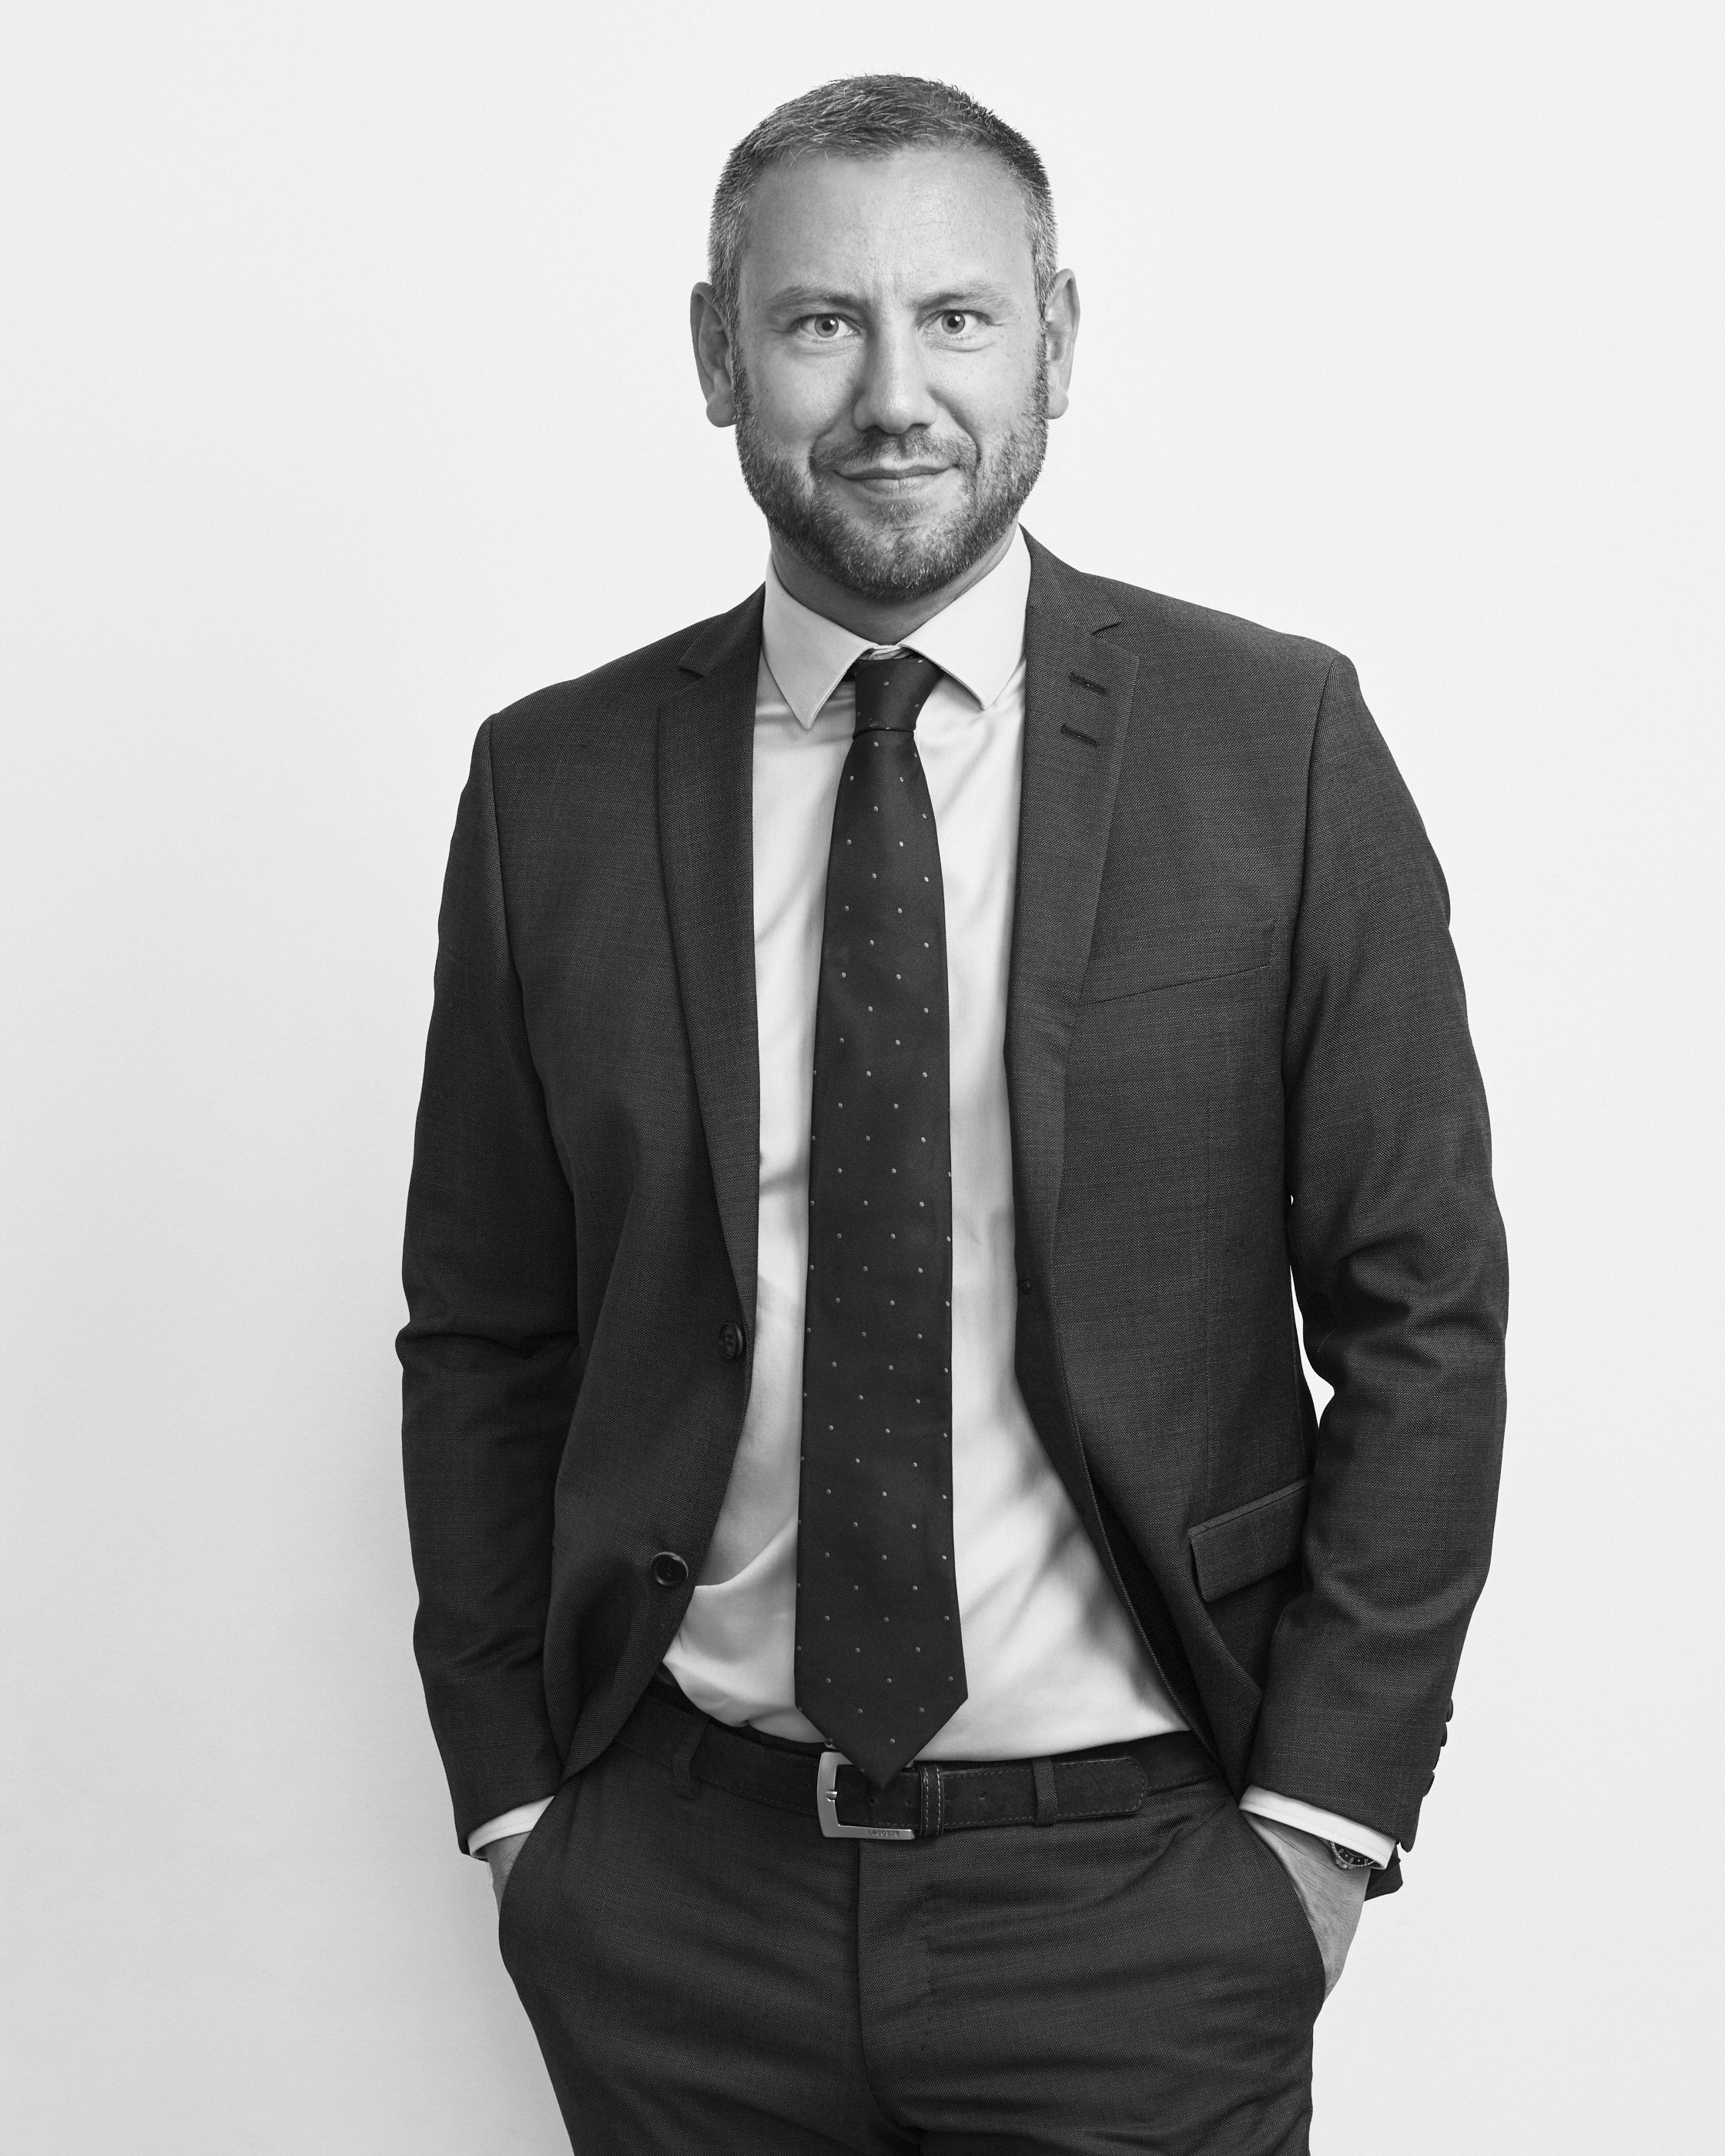 Jonas Ahnegård